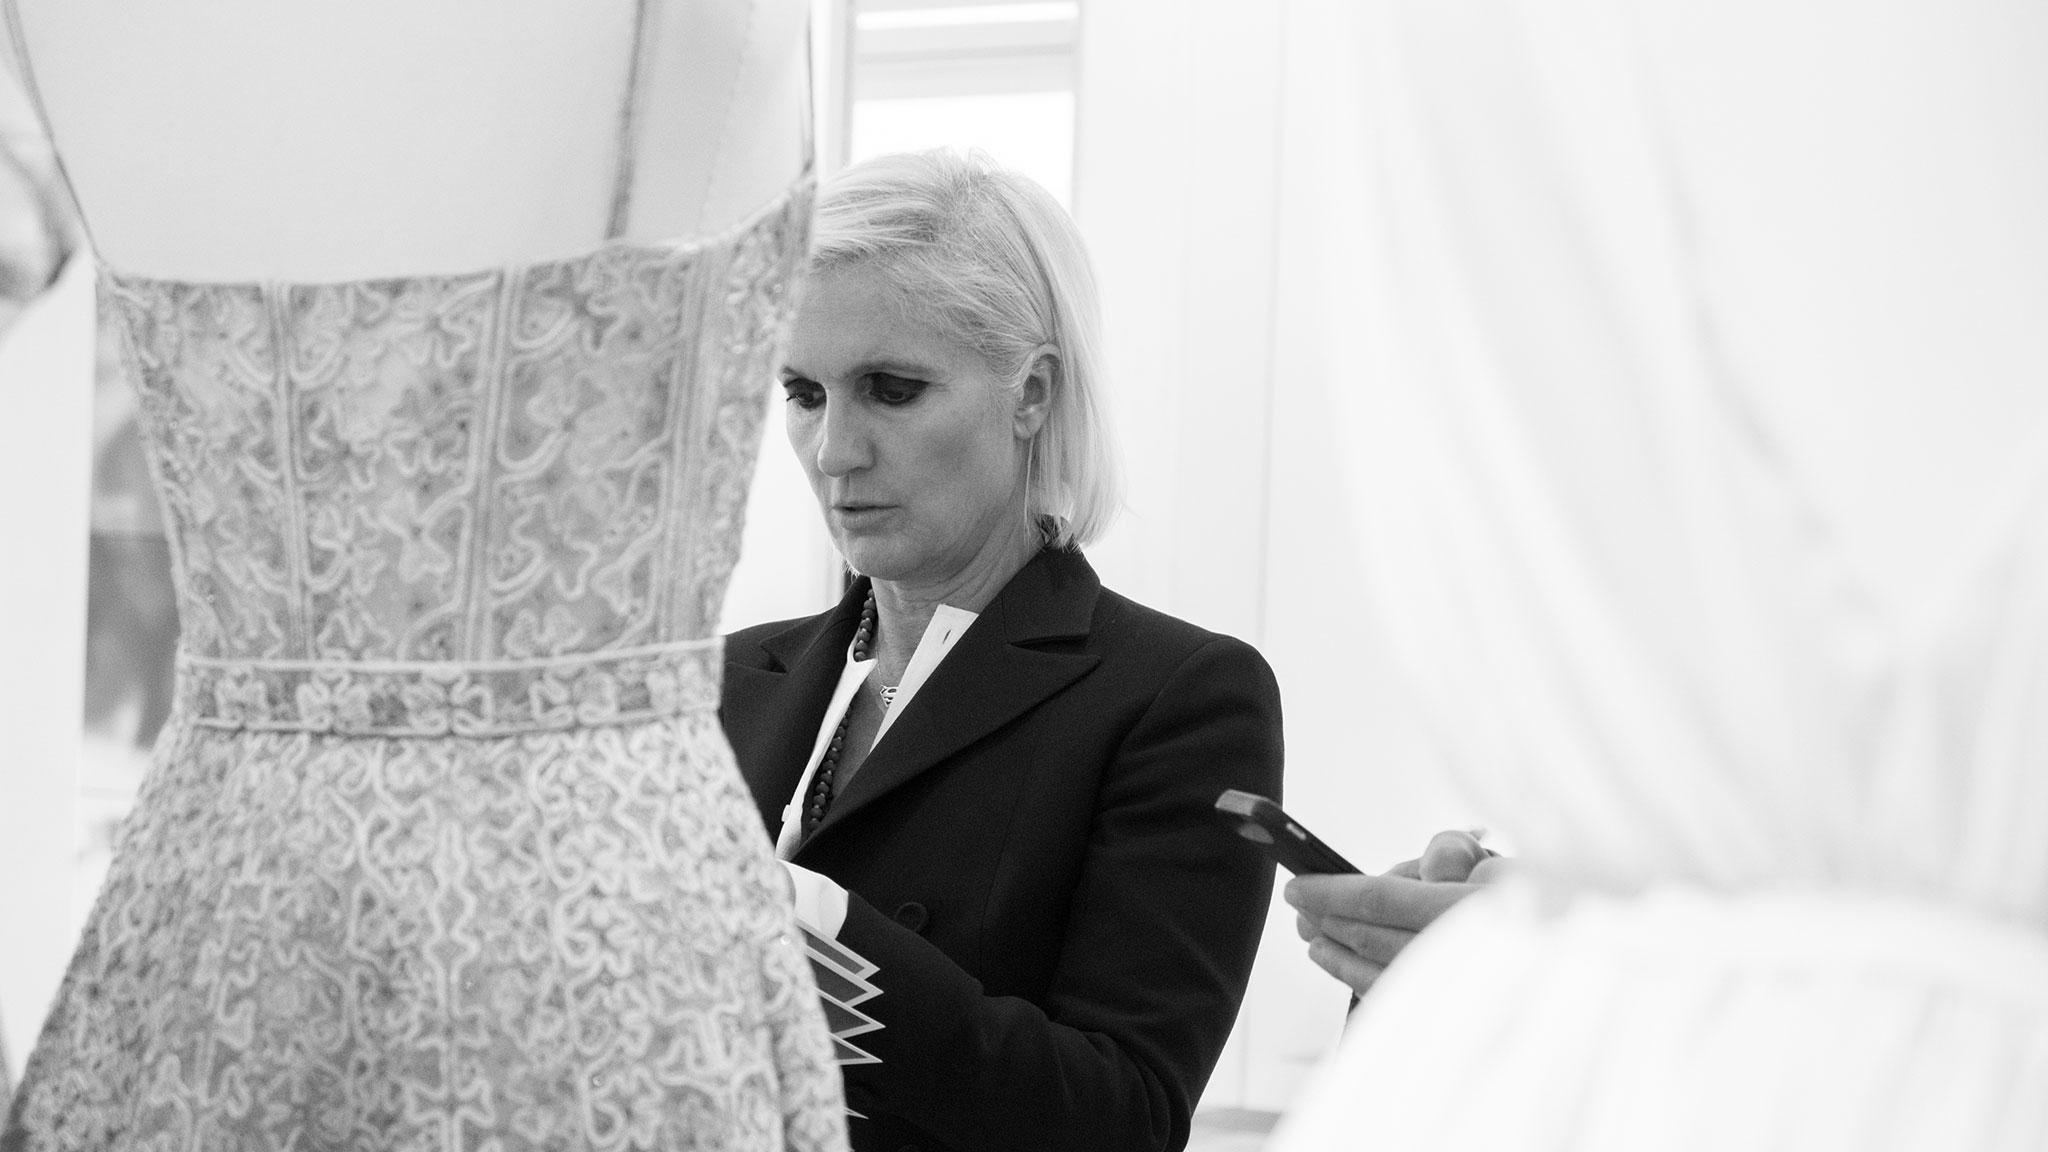 91a99ece8b4 Maria Grazia Chiuri on becoming the first female head of Dior ...